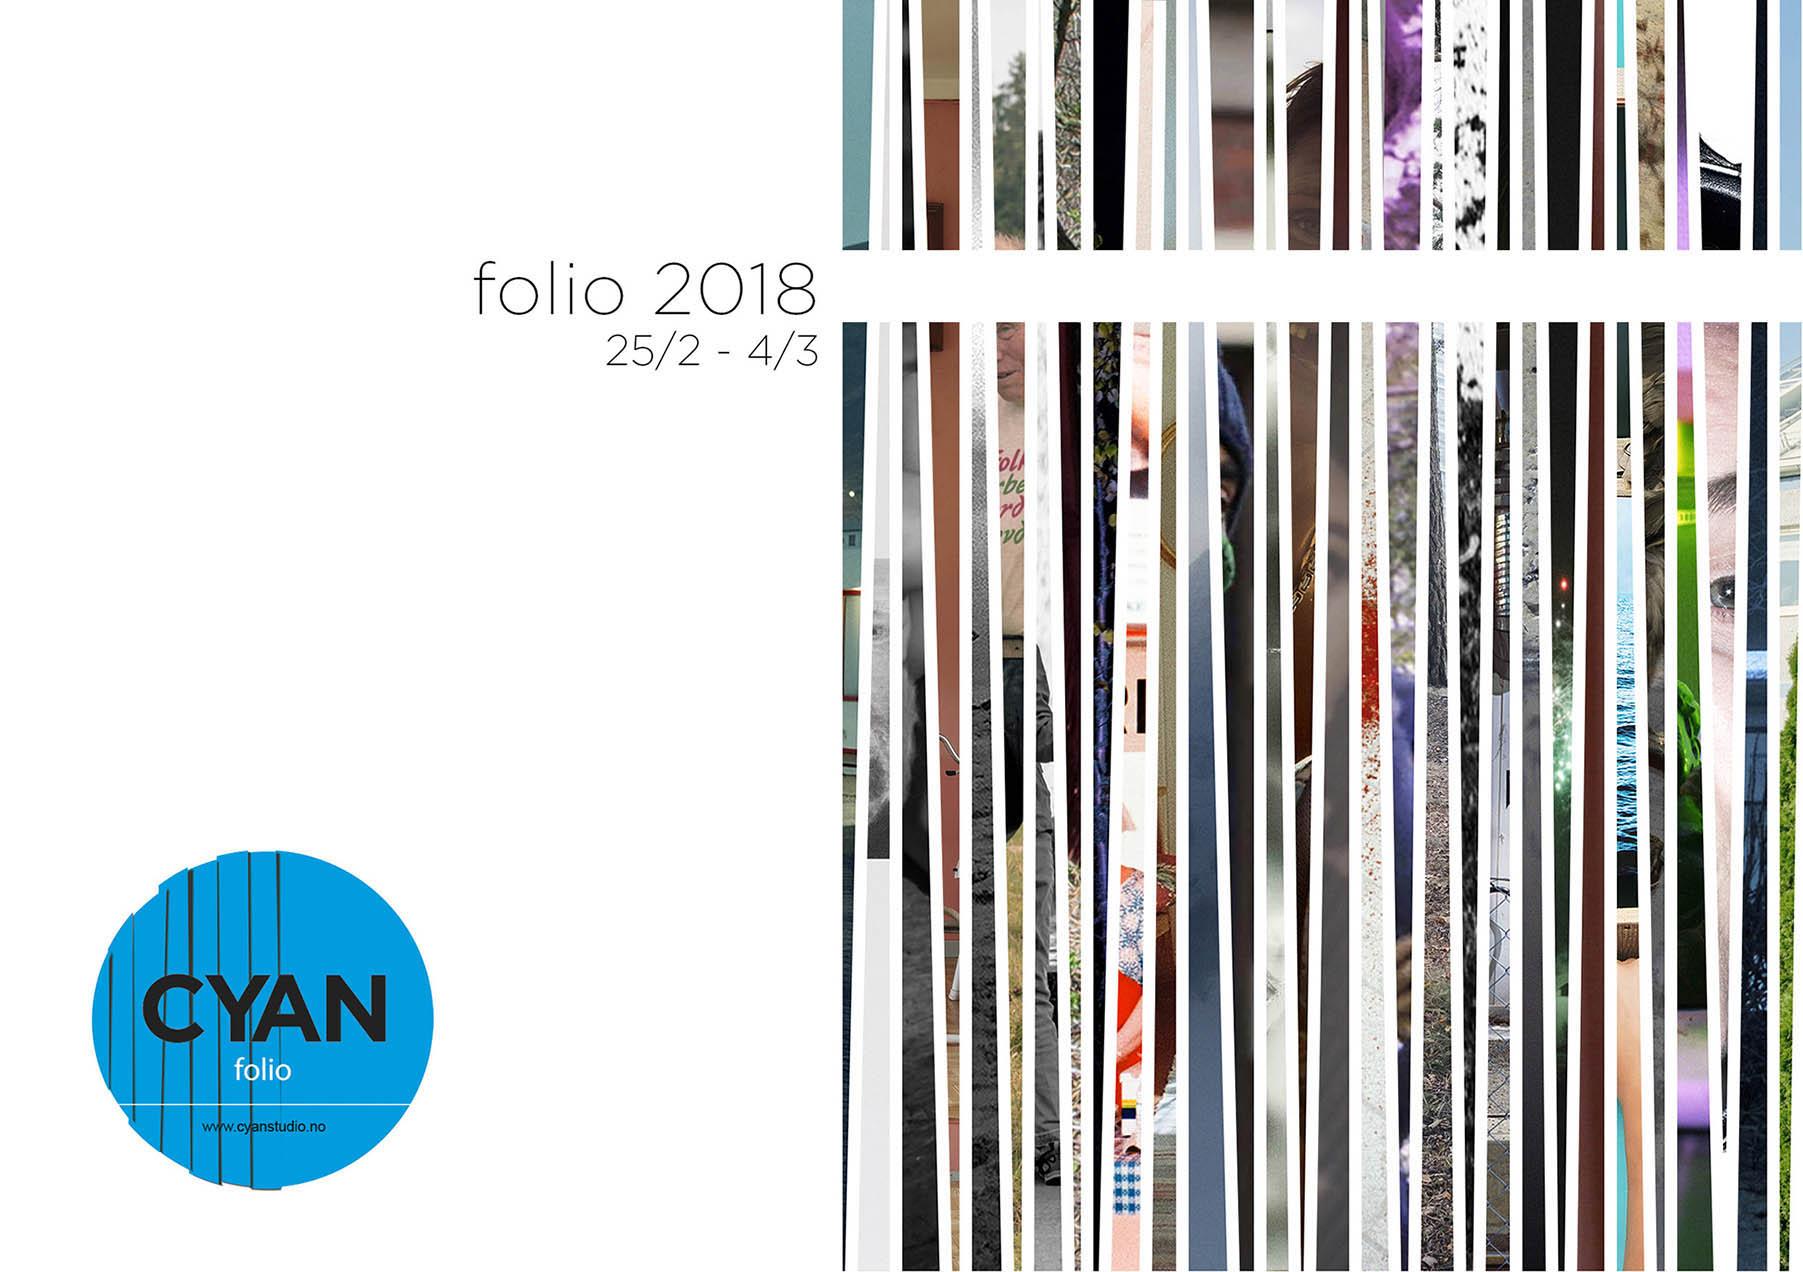 folio_flyer-web1.jpg